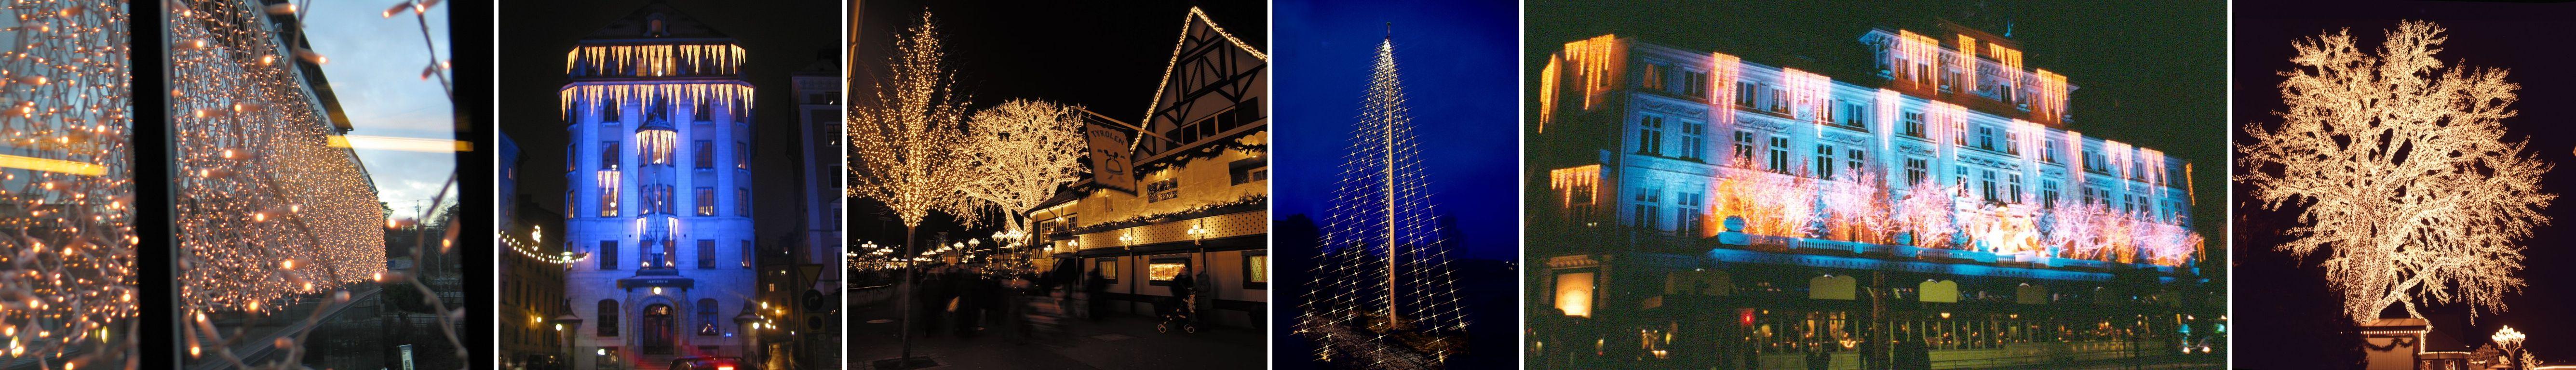 Juldekoration, trädbelysning,kedjebelysning,draperier led, B22 ledlampa,E27 led,flaggstångsbelysning,fasaddekoration, LD 70,julgransbelysning.